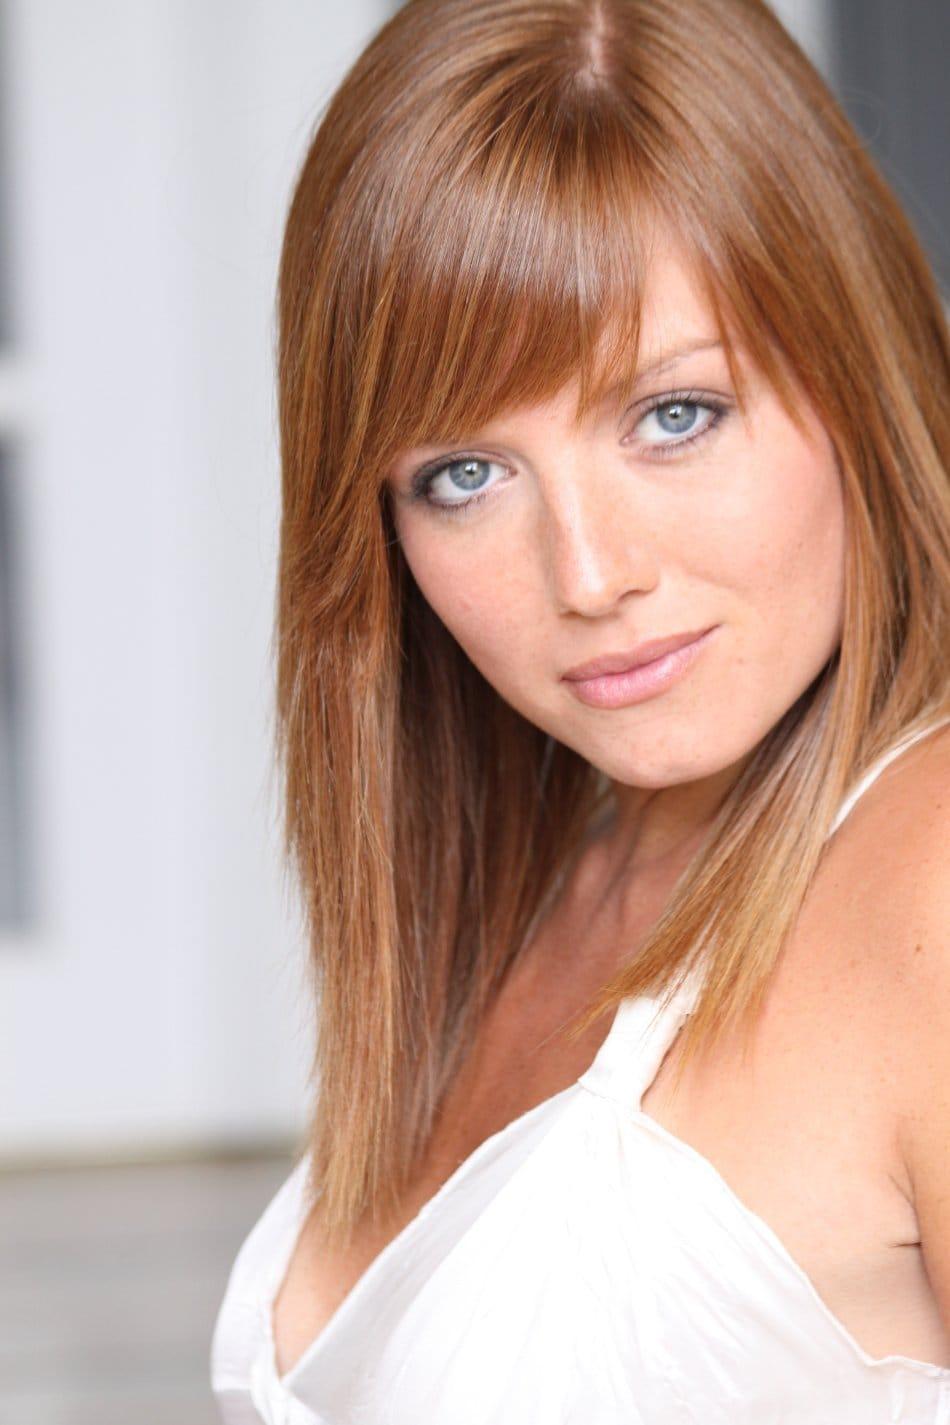 Natalie Britton Nude Photos 1